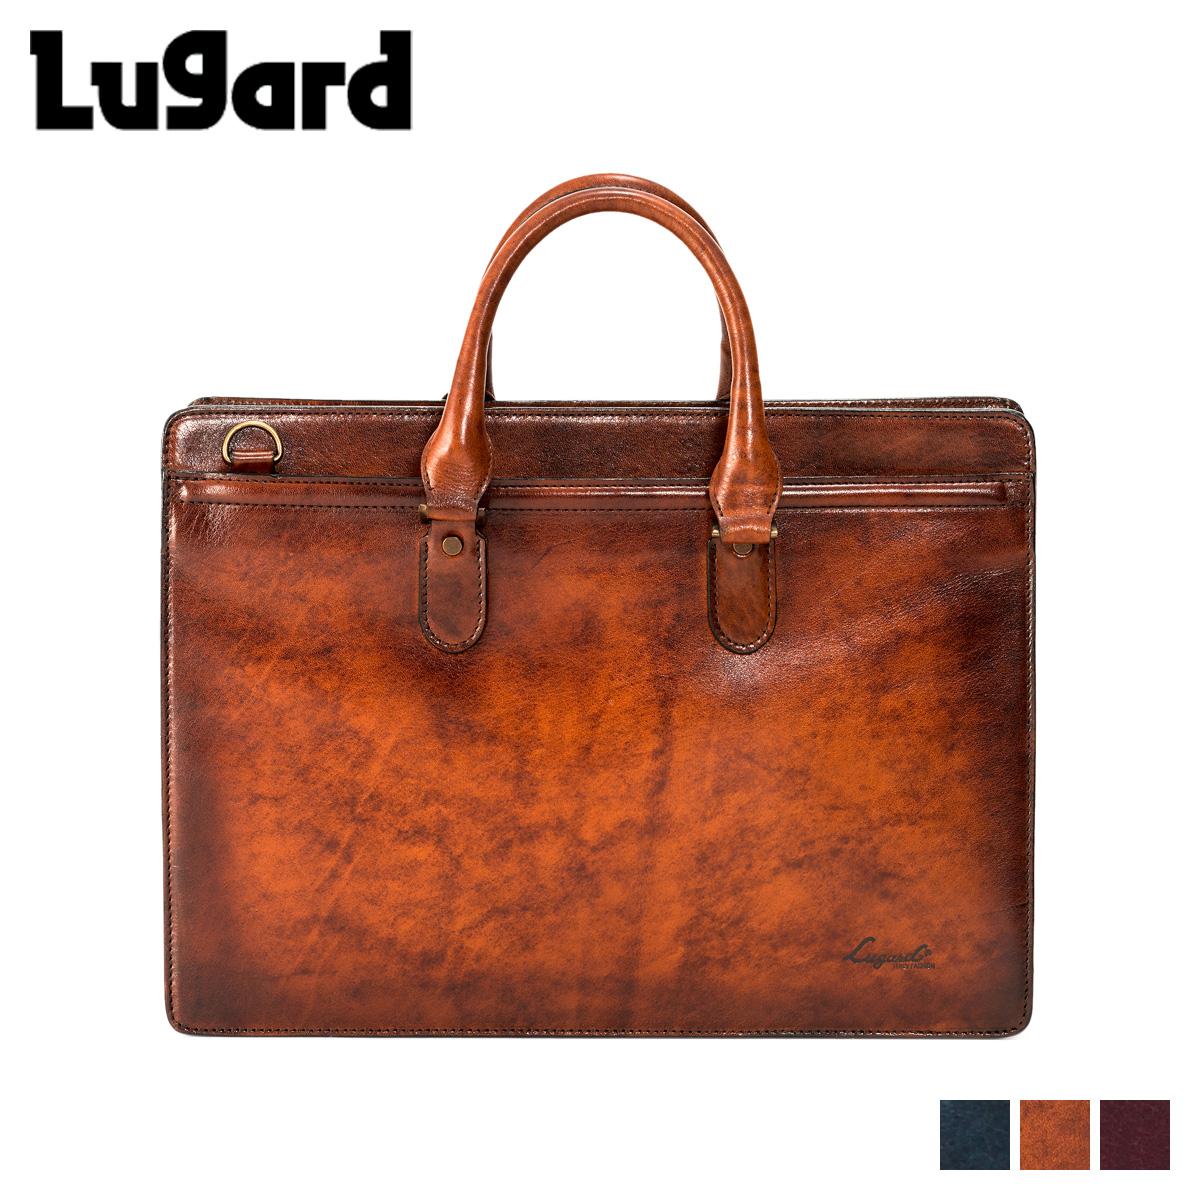 Lugard ラガード 青木鞄 ジースリー バッグ ビジネスバッグ メンズ ラウンド G3 BUSINESS BAG ネイビー ブラウン ボルドー 5228